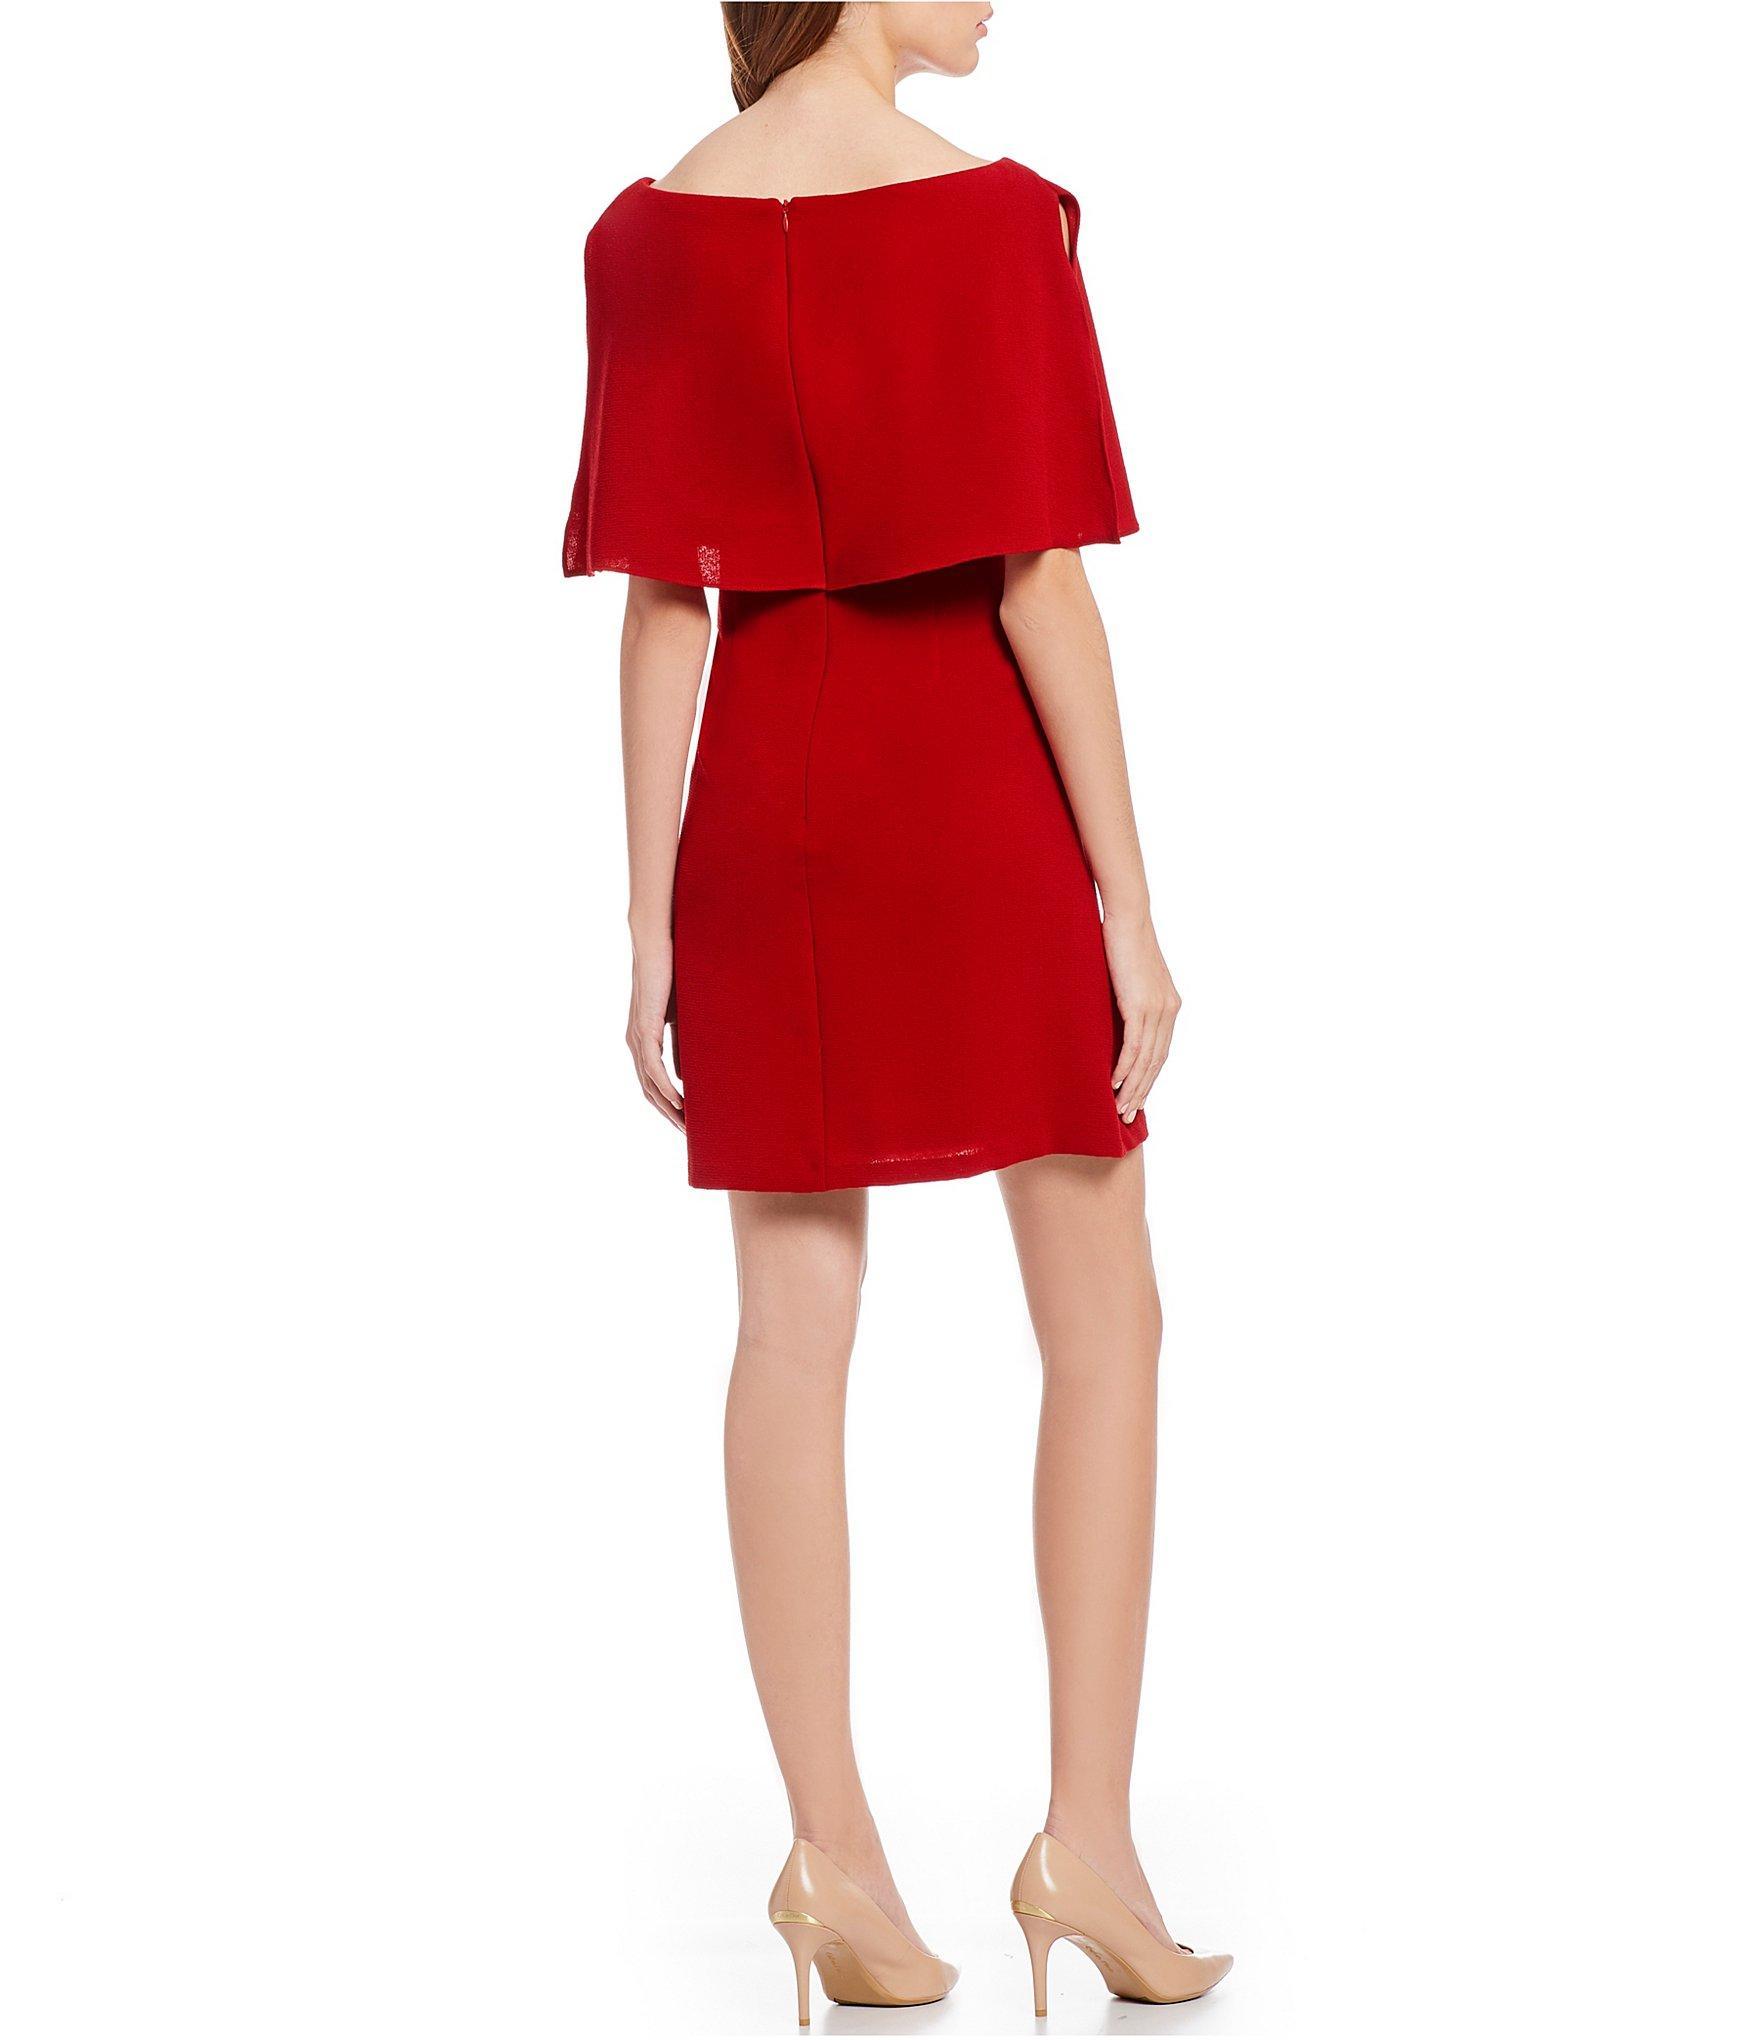 08c7a0fa8ec4 Adrianna Papell - Red Split Sleeve Popover Dress - Lyst. View fullscreen